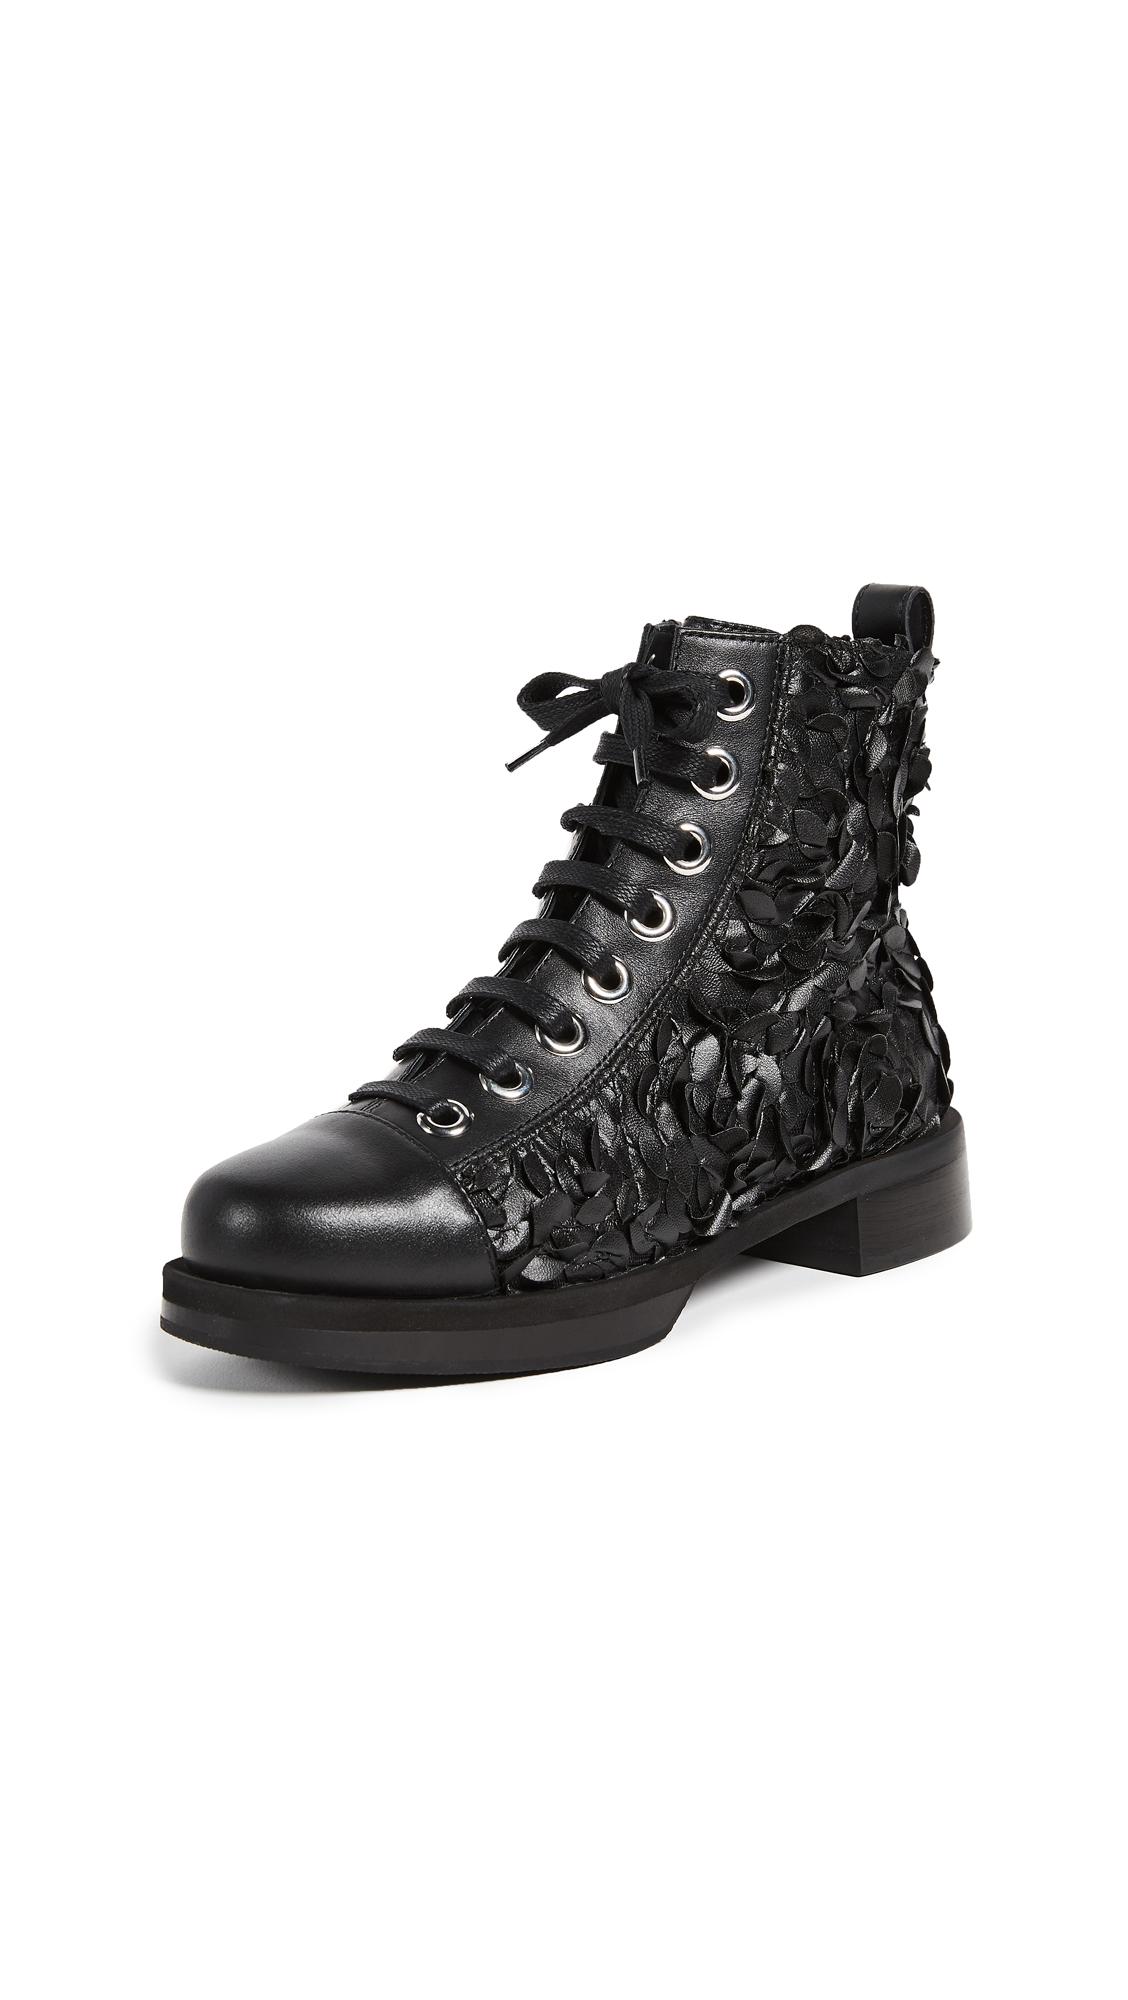 Greymer College Campari Combat Boots - Nero